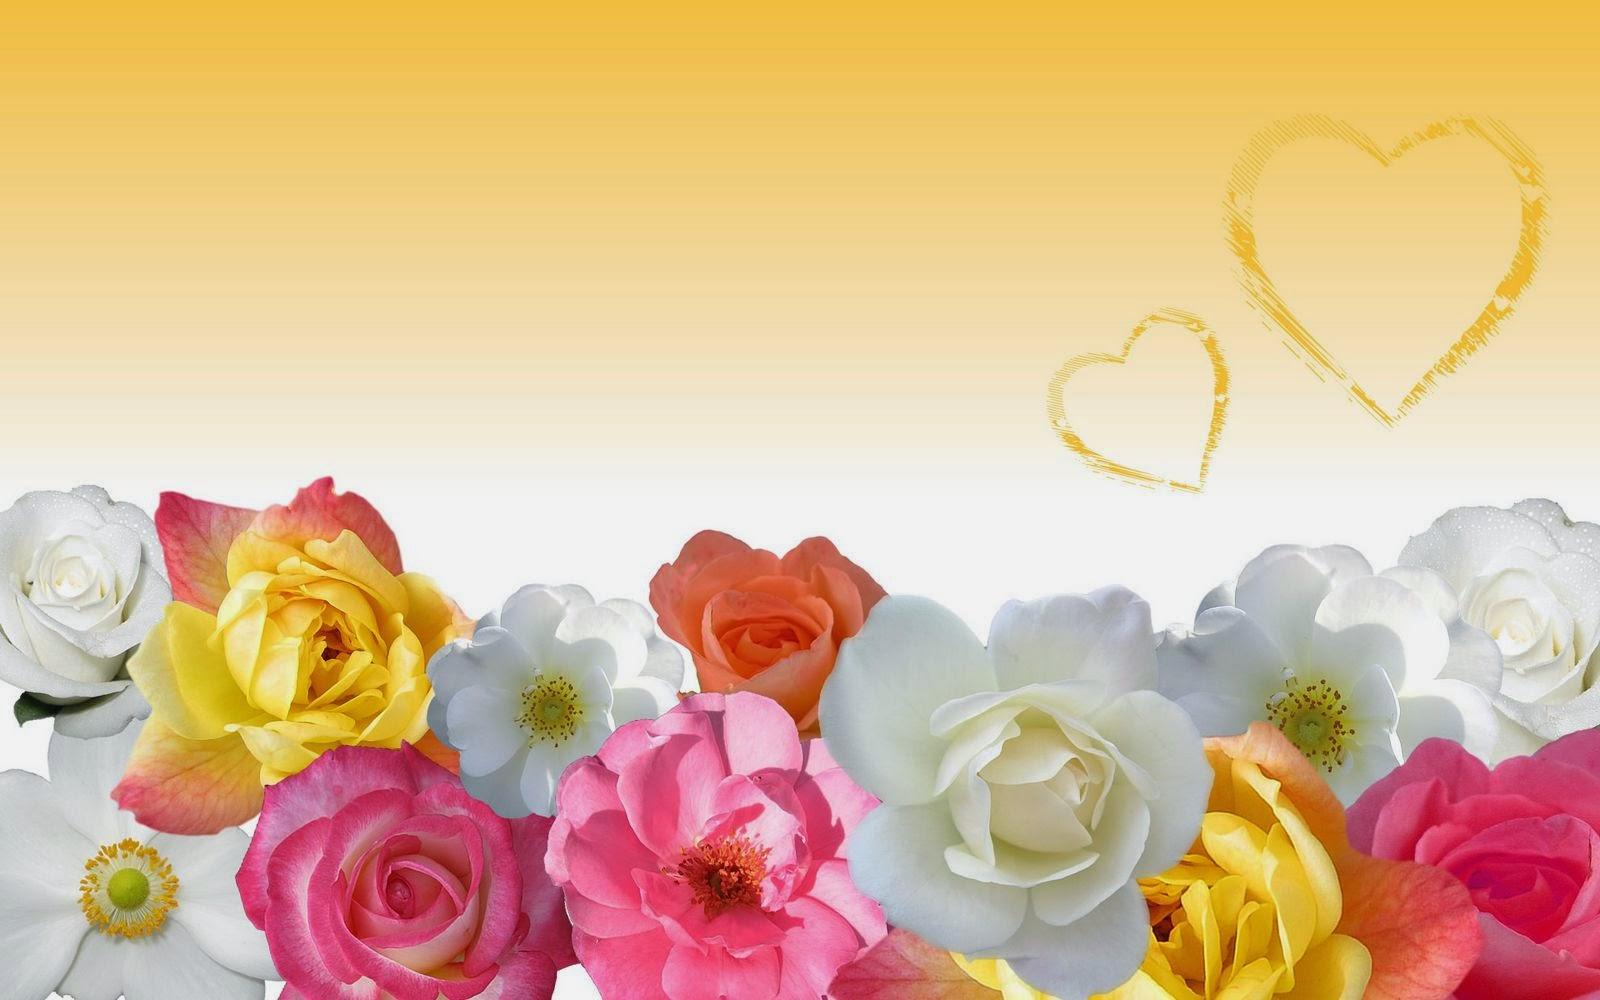 flower-power-wallpaper-yellow